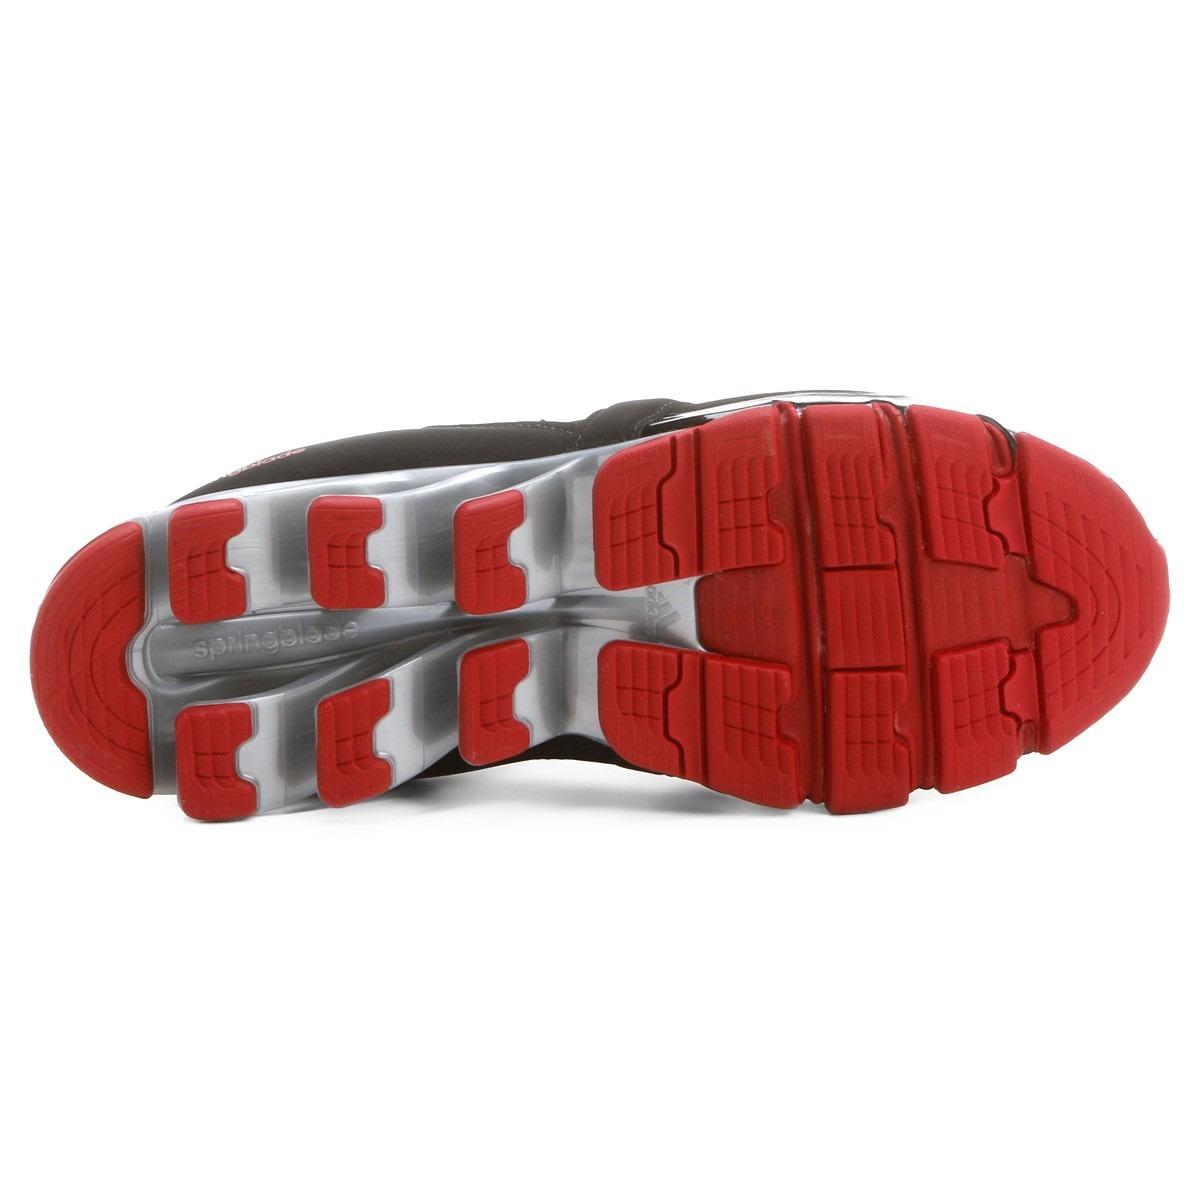 36037816ee5 tenis adidas springblade h68448 masculino original + nf. Carregando zoom.